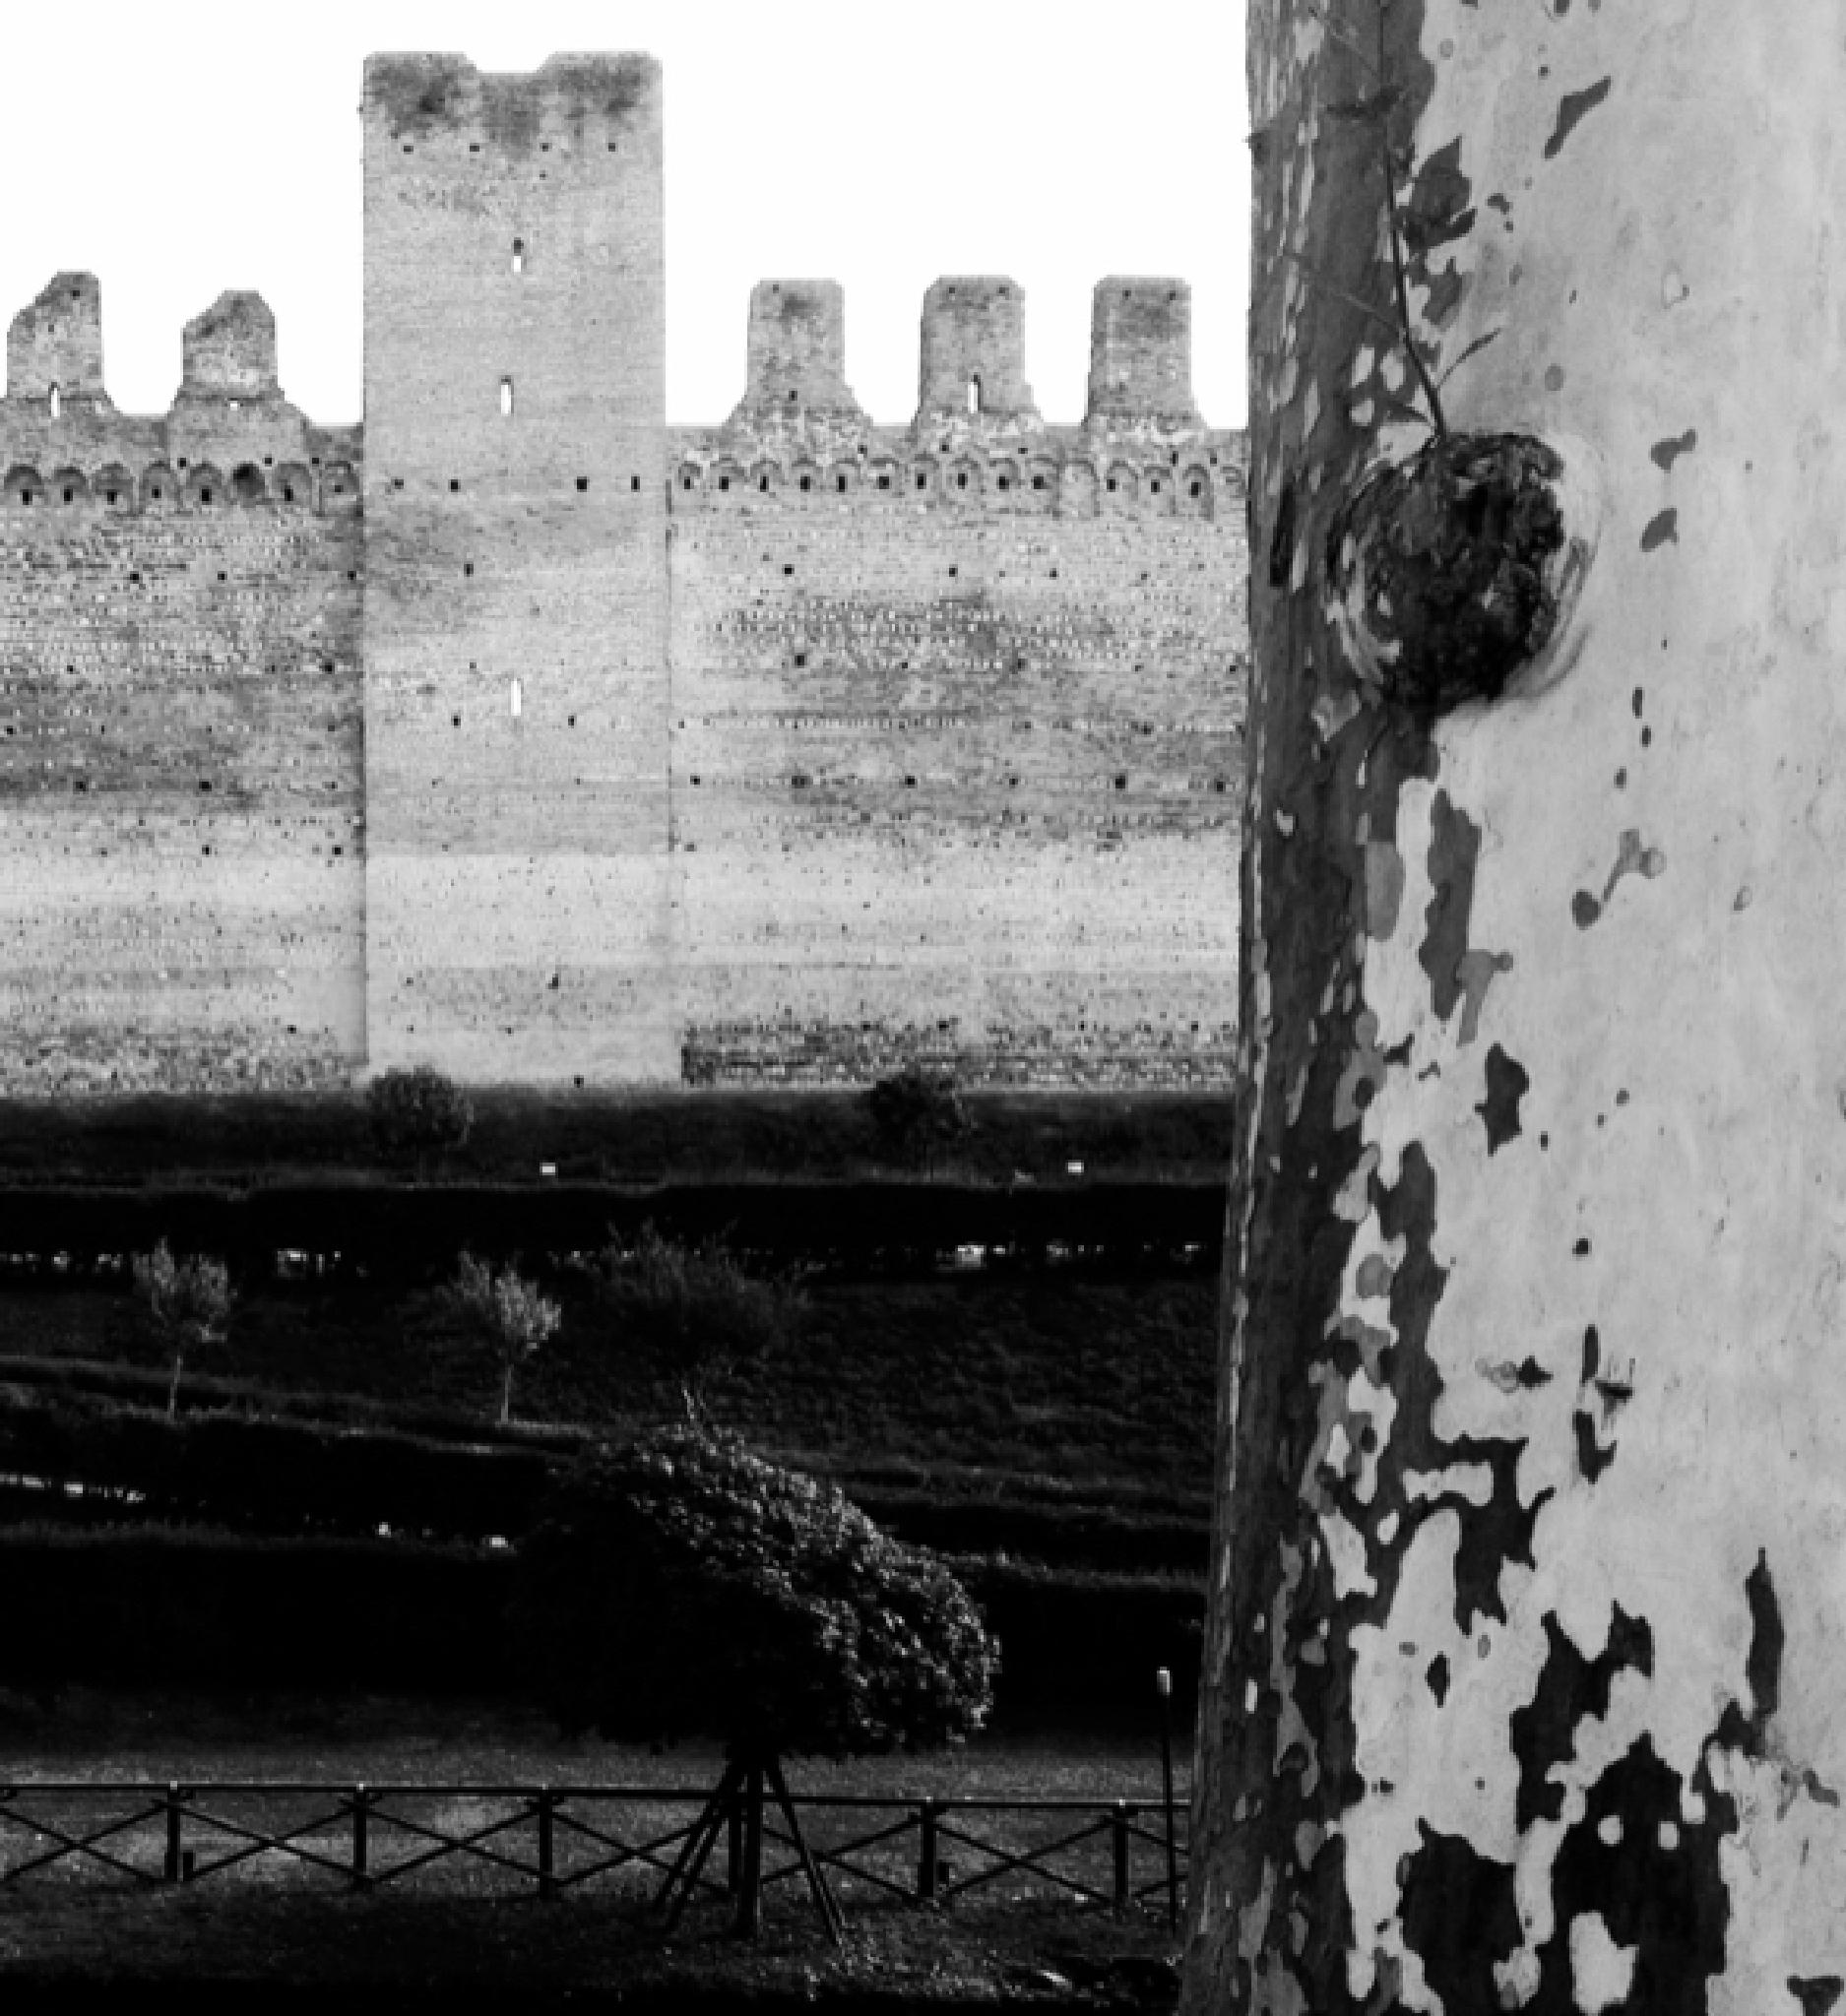 IMG_0159 by Alessandra Fierimonte